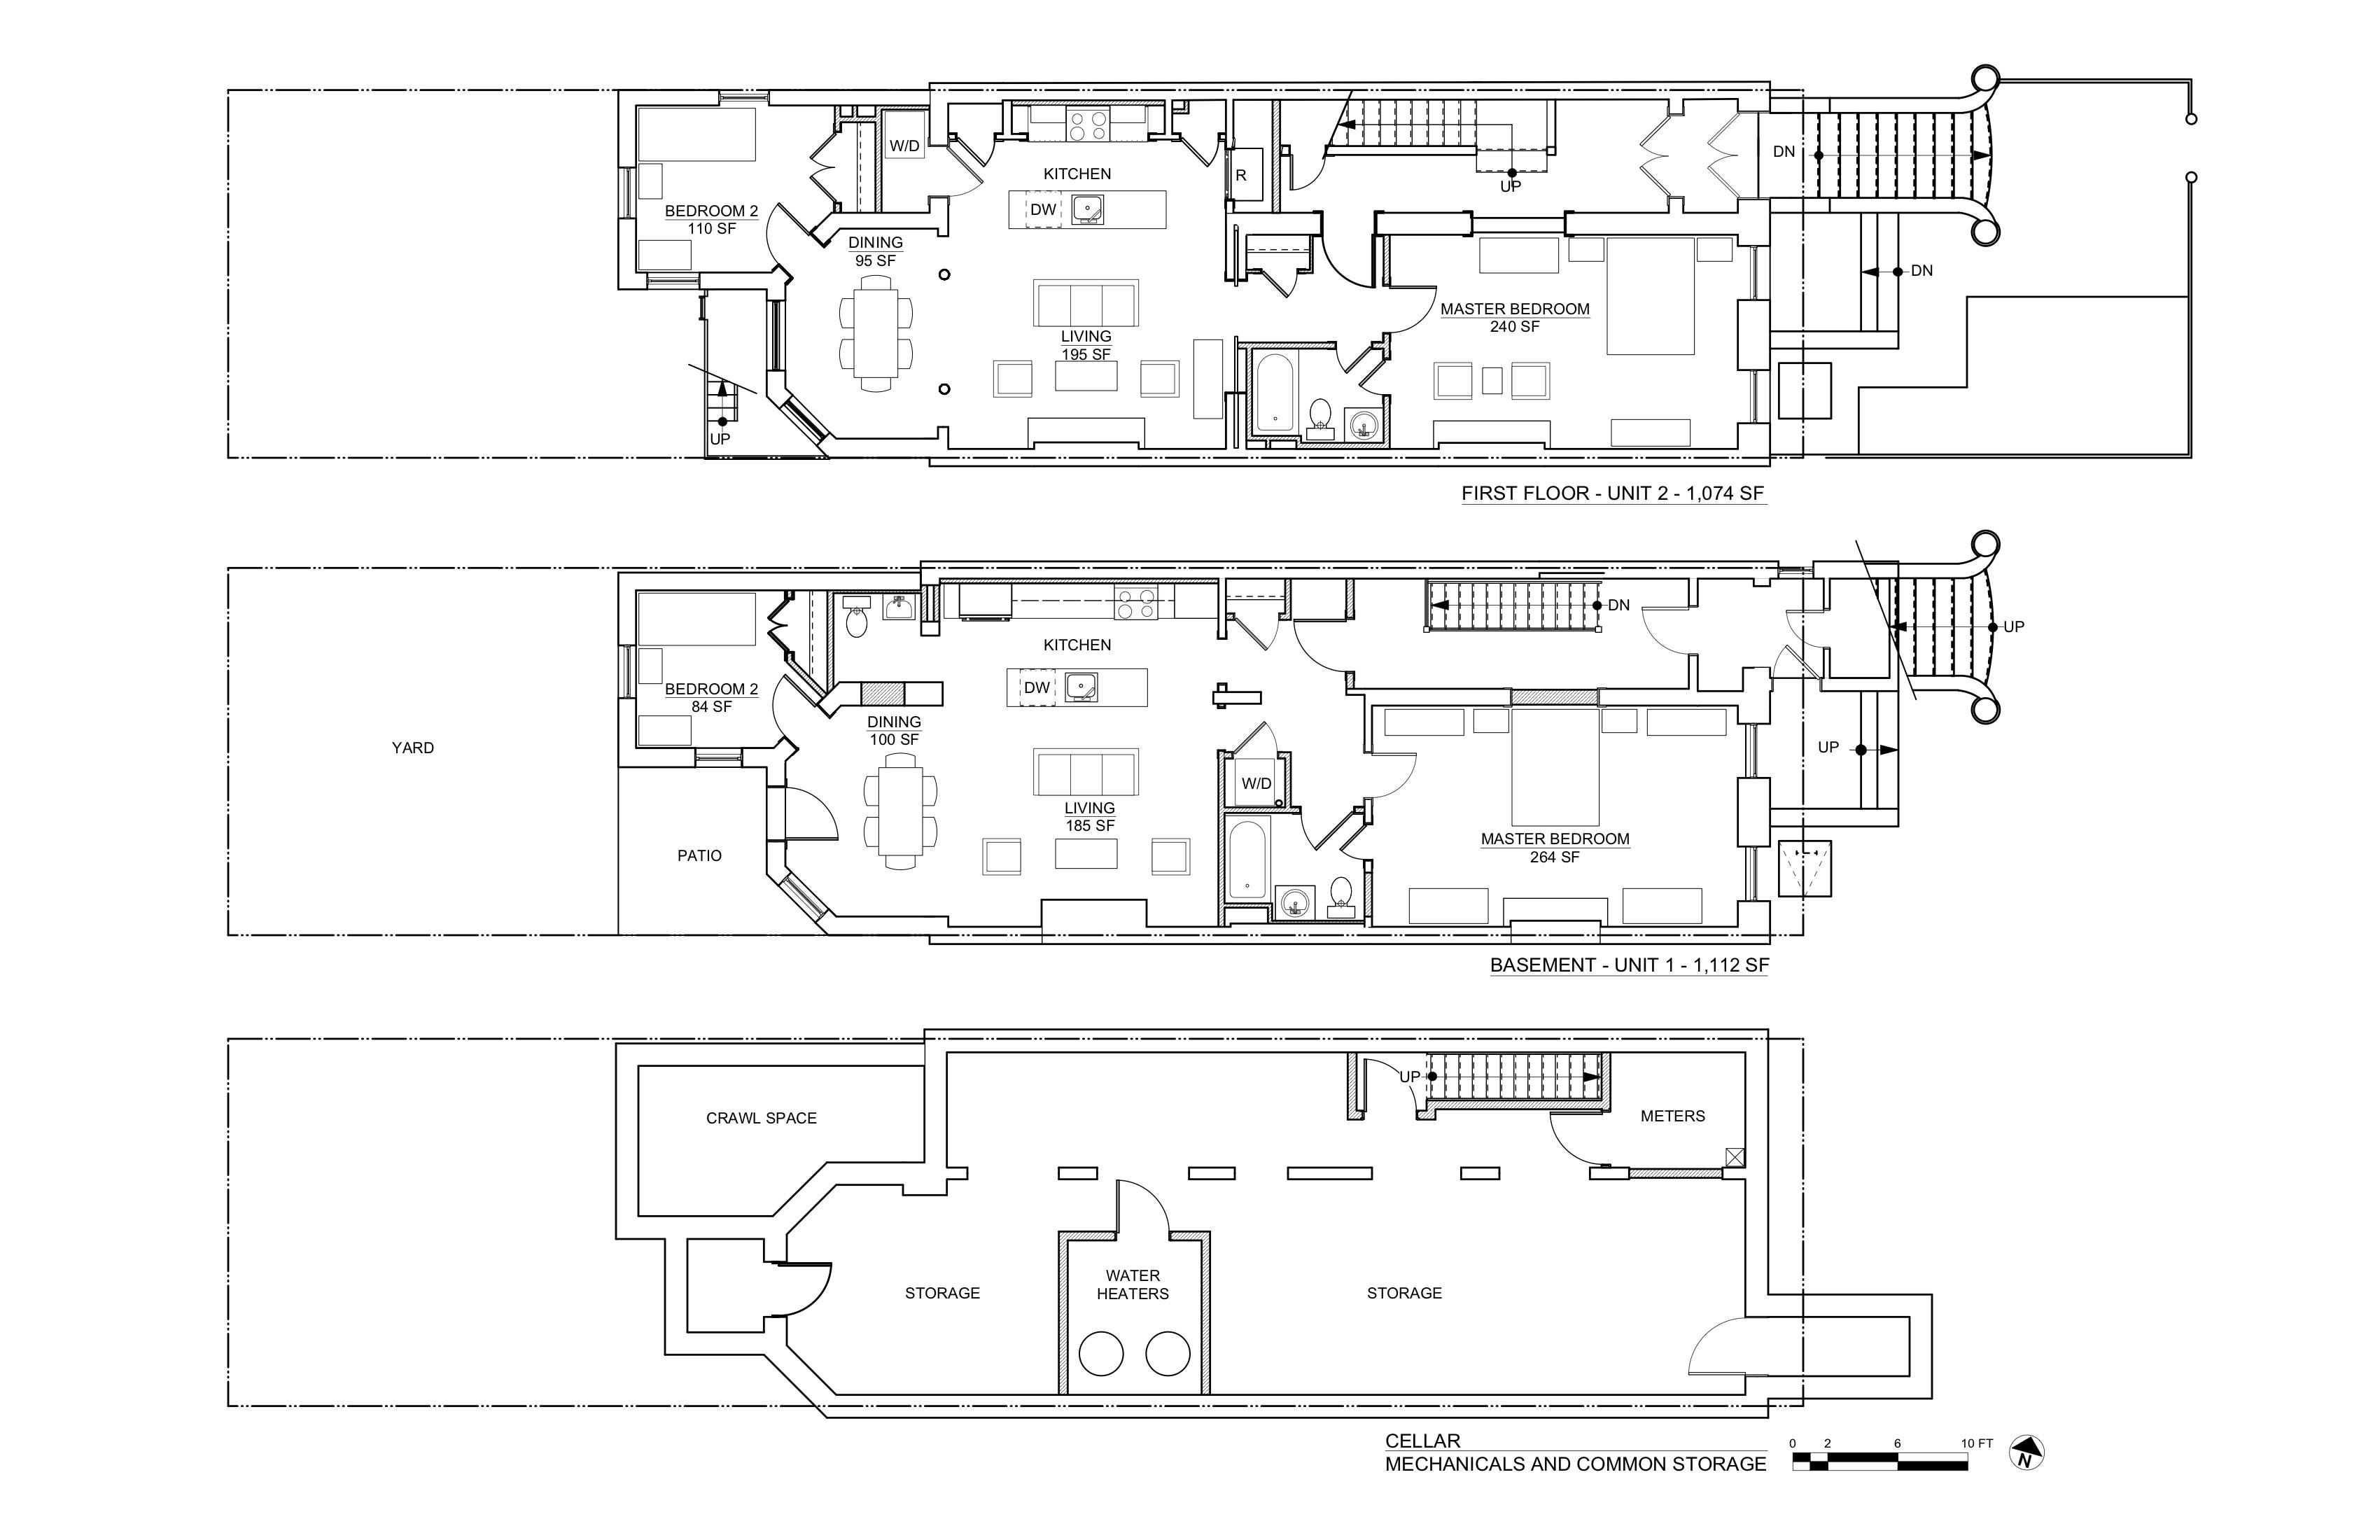 CLINTON PLANS CELLAR BASEMENT 1ST FLOORS